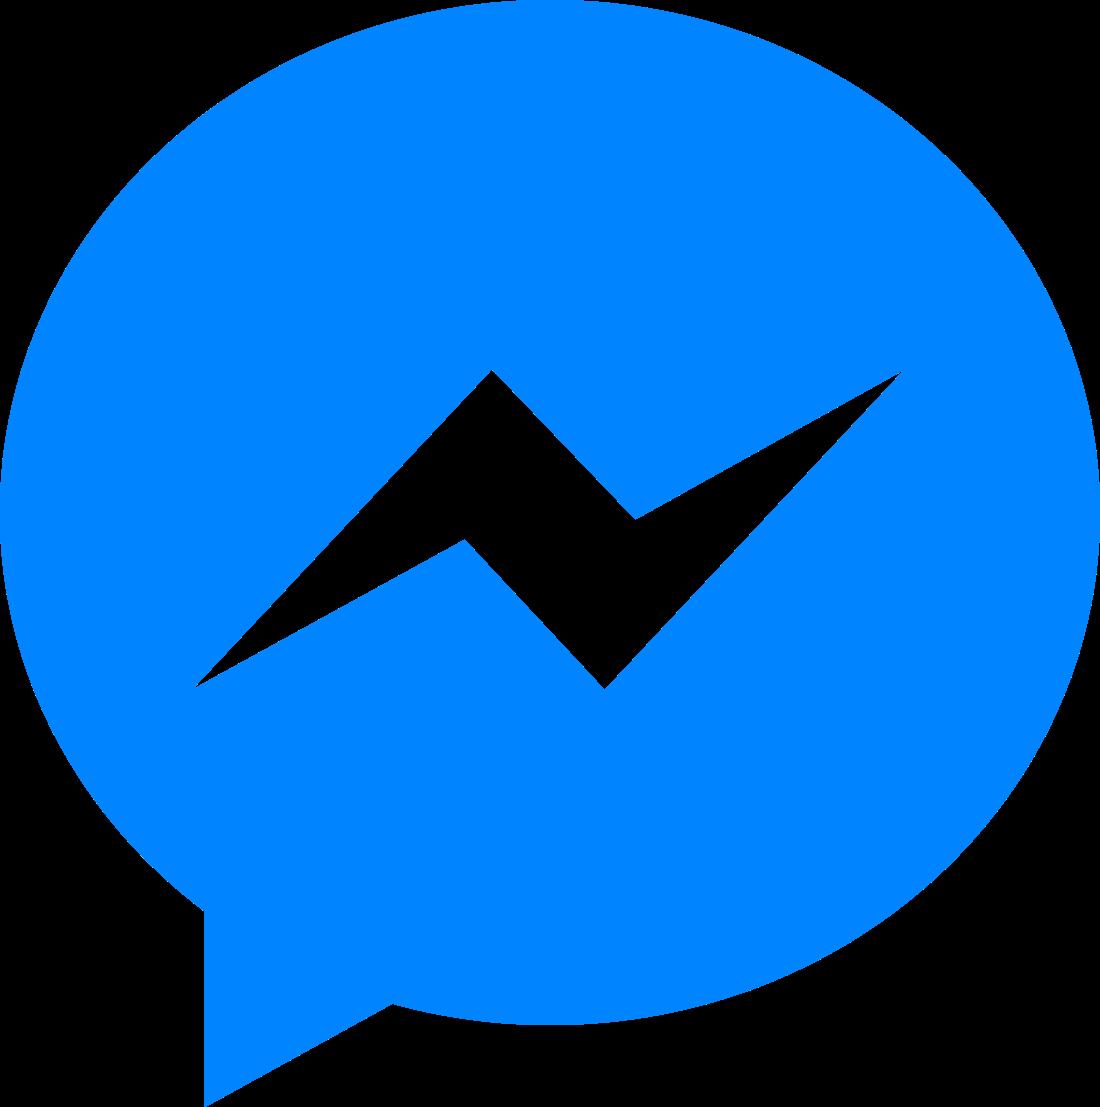 facebook-messenger-icone-3